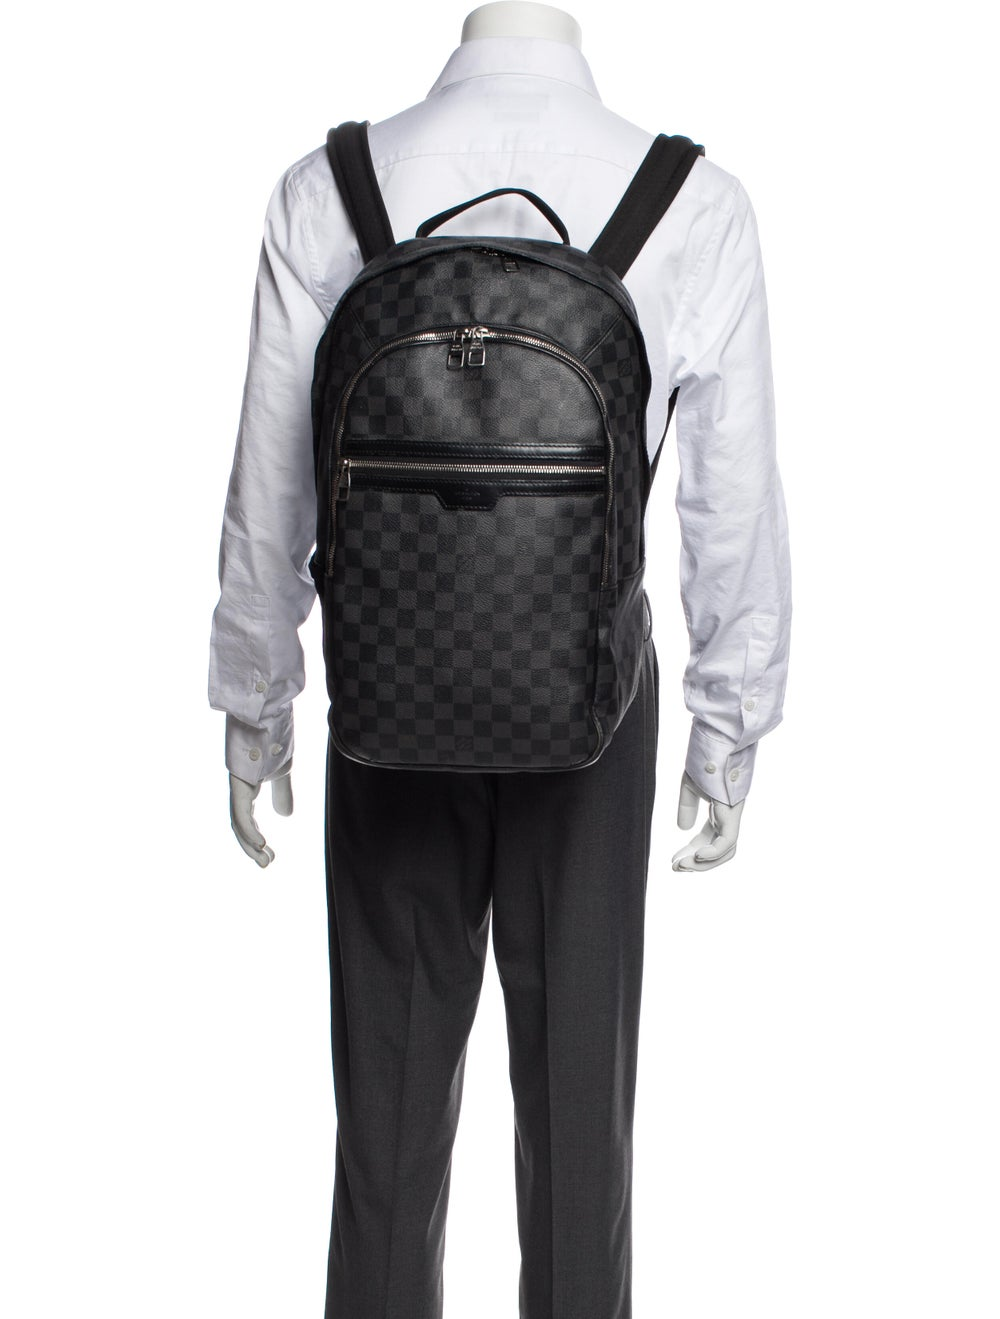 Louis Vuitton Damier Graphite Michael Backpack Gr… - image 3